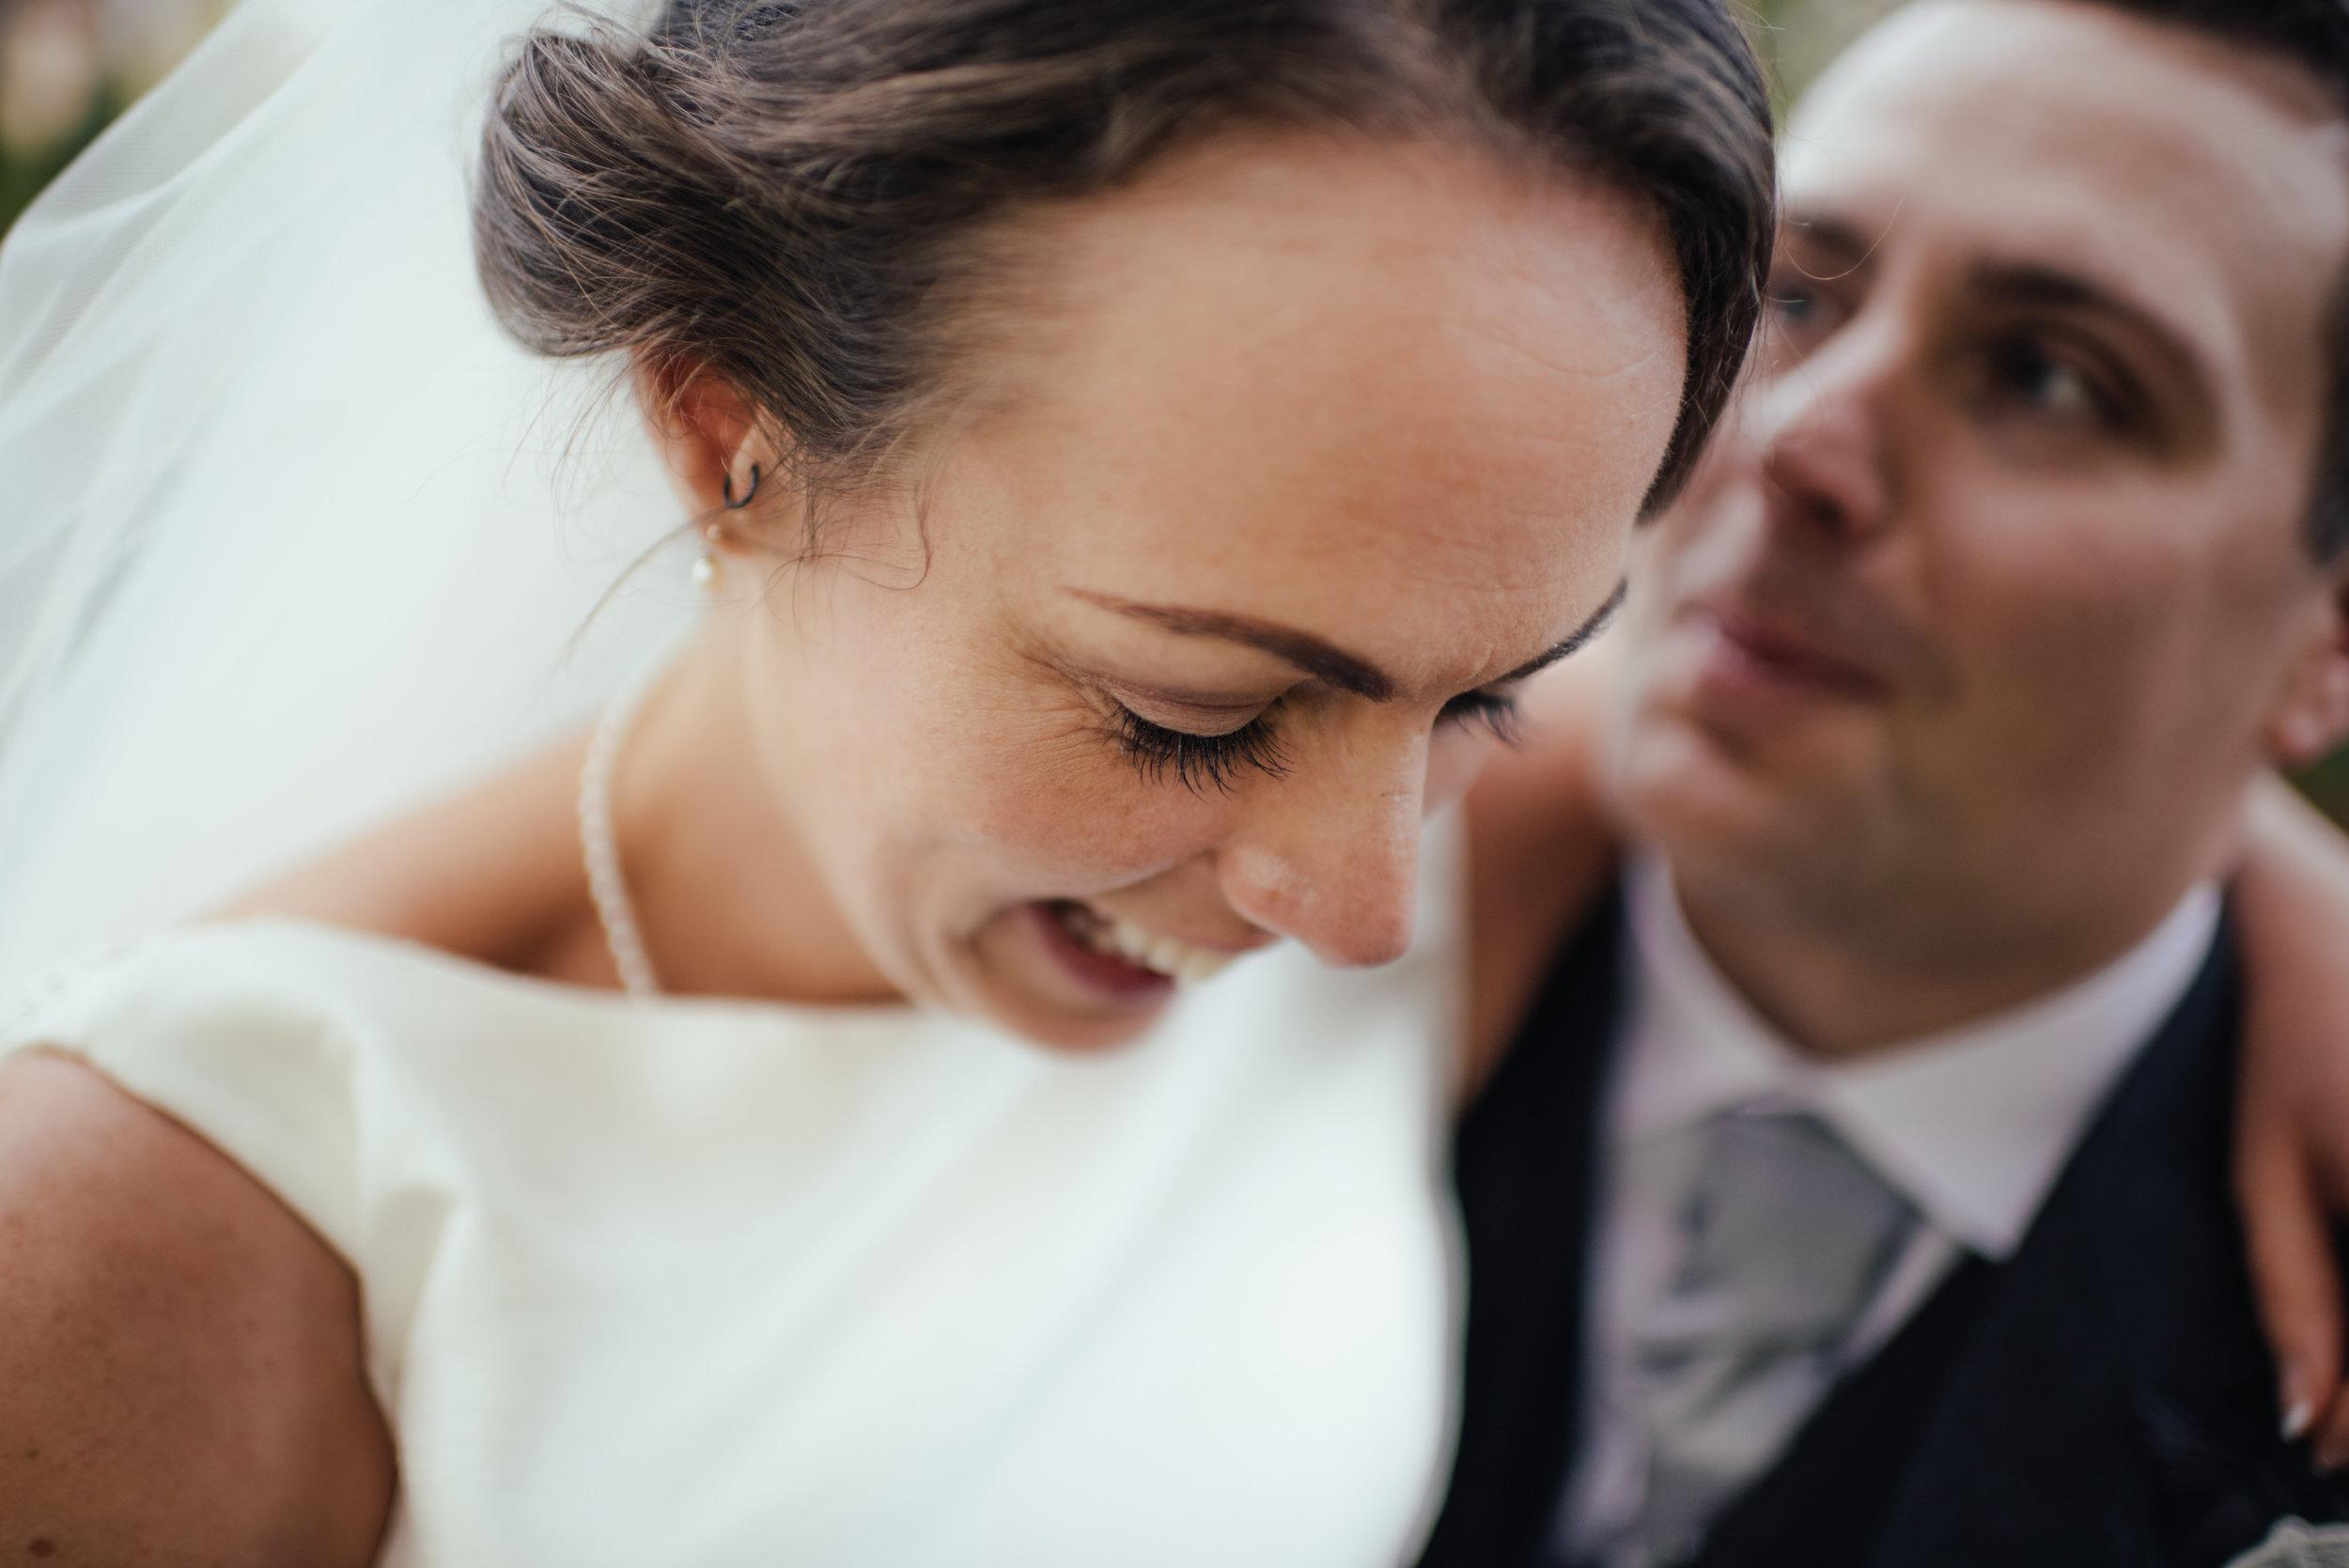 0129-LISA-DEVINE-PHOTOGRAPHY-ALTERNATIVE-WEDDING-PHOTOGRAPHY-SCOTLAND-DESTINATION-WEDDINGS-GLASGOW-WEDDINGS-COOL-WEDDINGS-STYLISH-WEDDINGS.JPG